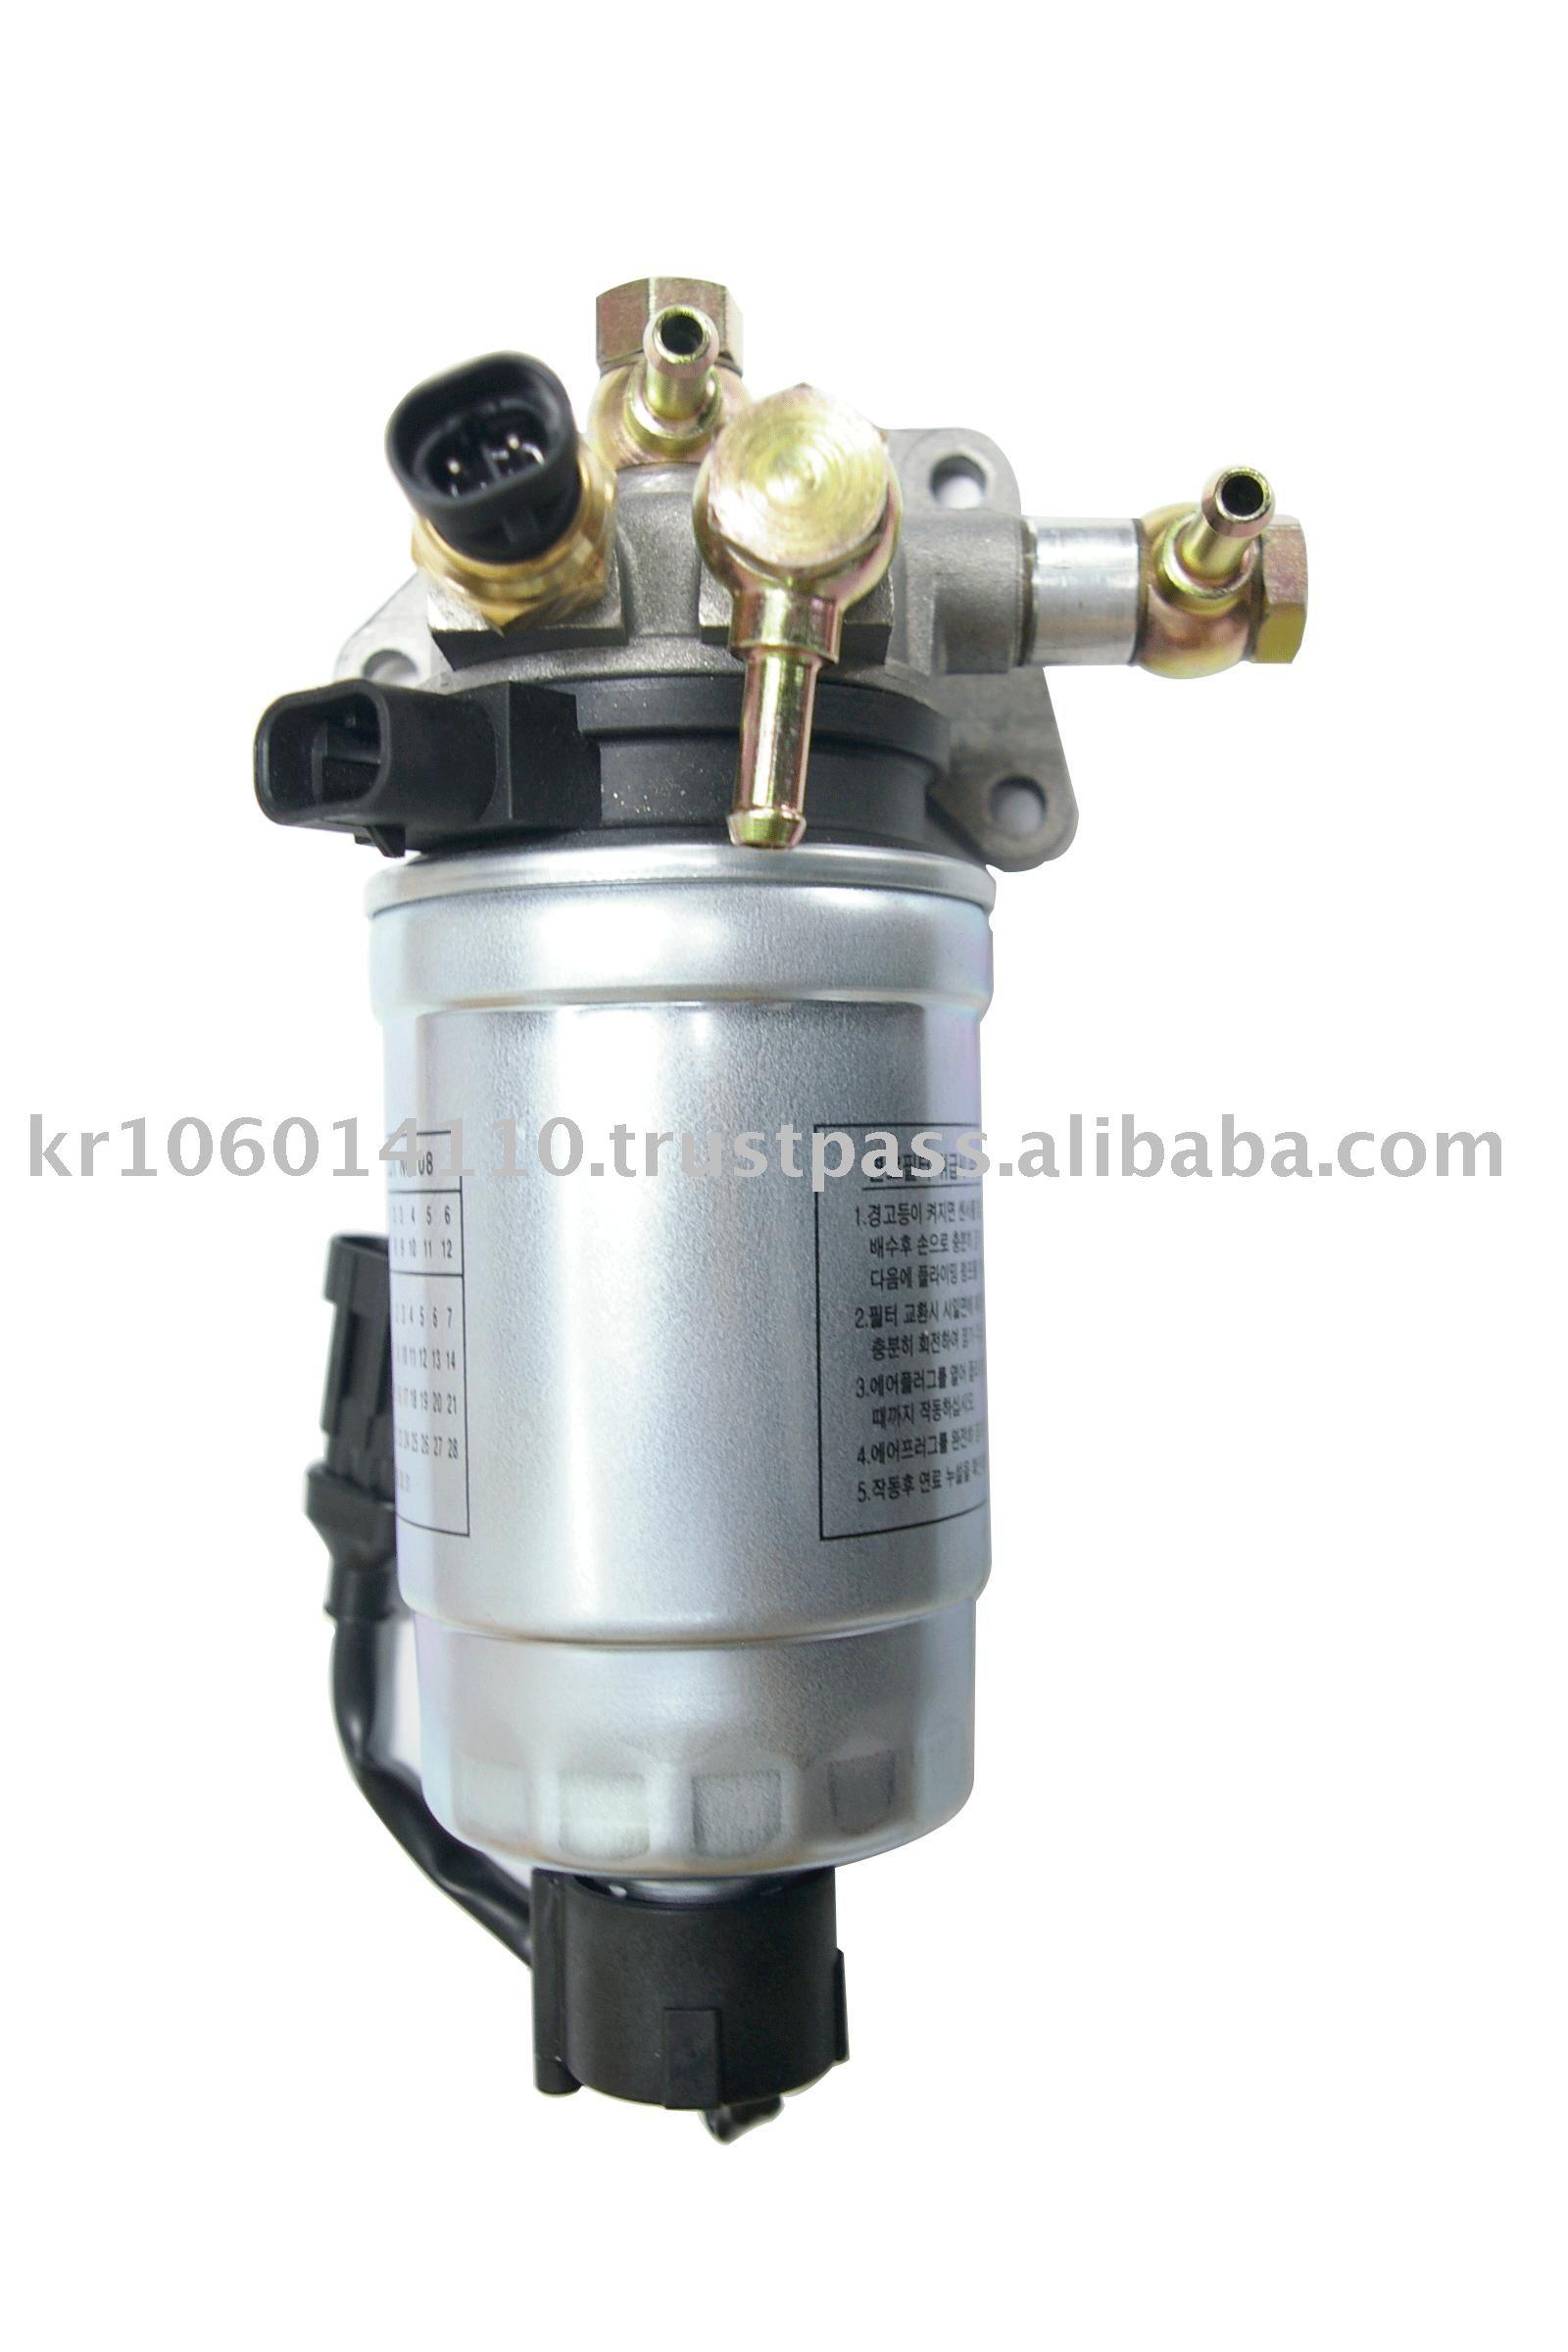 Crdi Fuel Filter(carens2 {kia} /x-trek {kia} ) - Buy Fuel Filter,Kia,Car Fuel  Filter Product on Alibaba.com